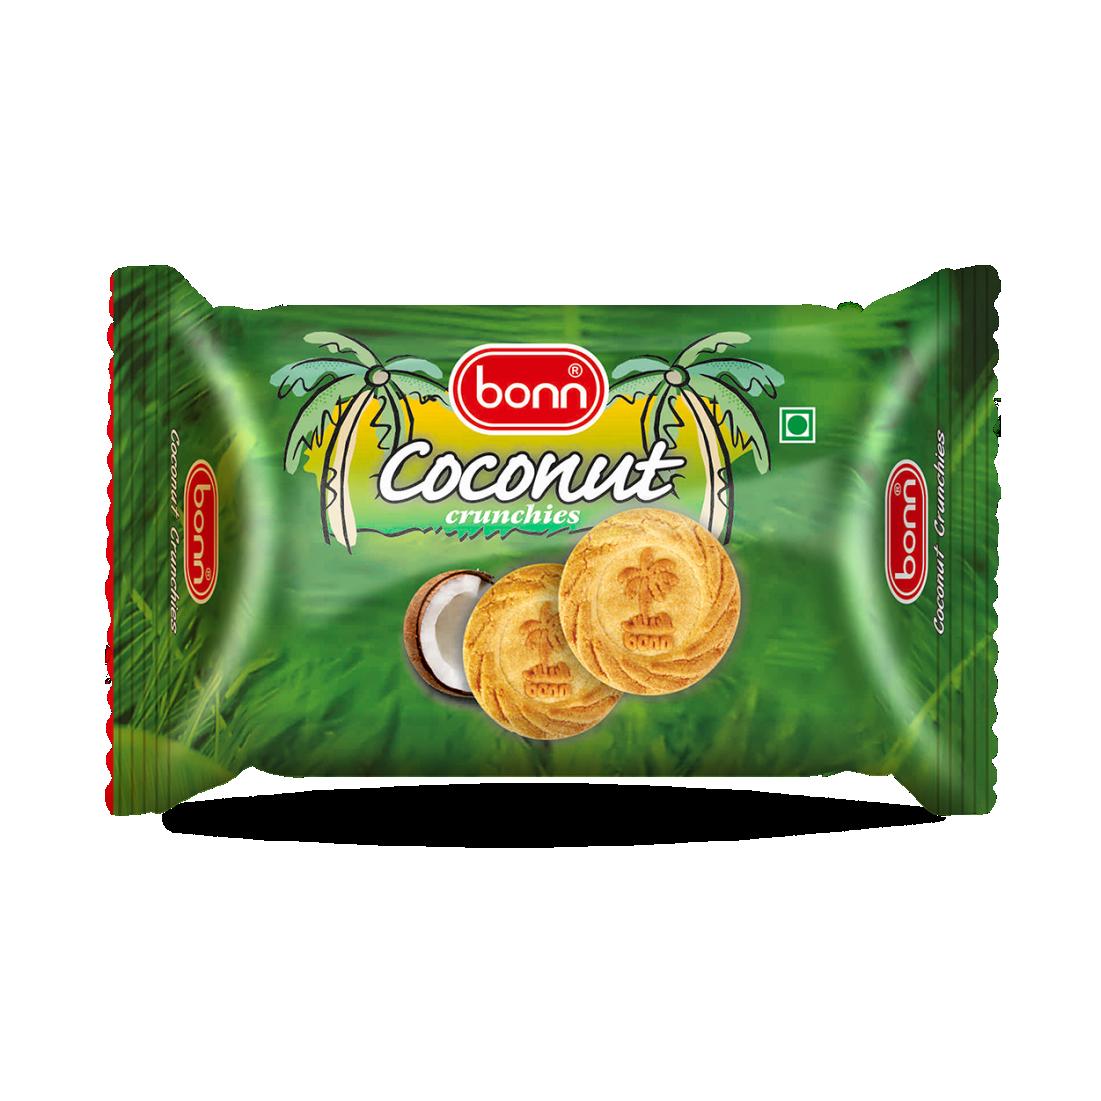 Bonn Coconut Crunch Biscuits, 80 g Pack